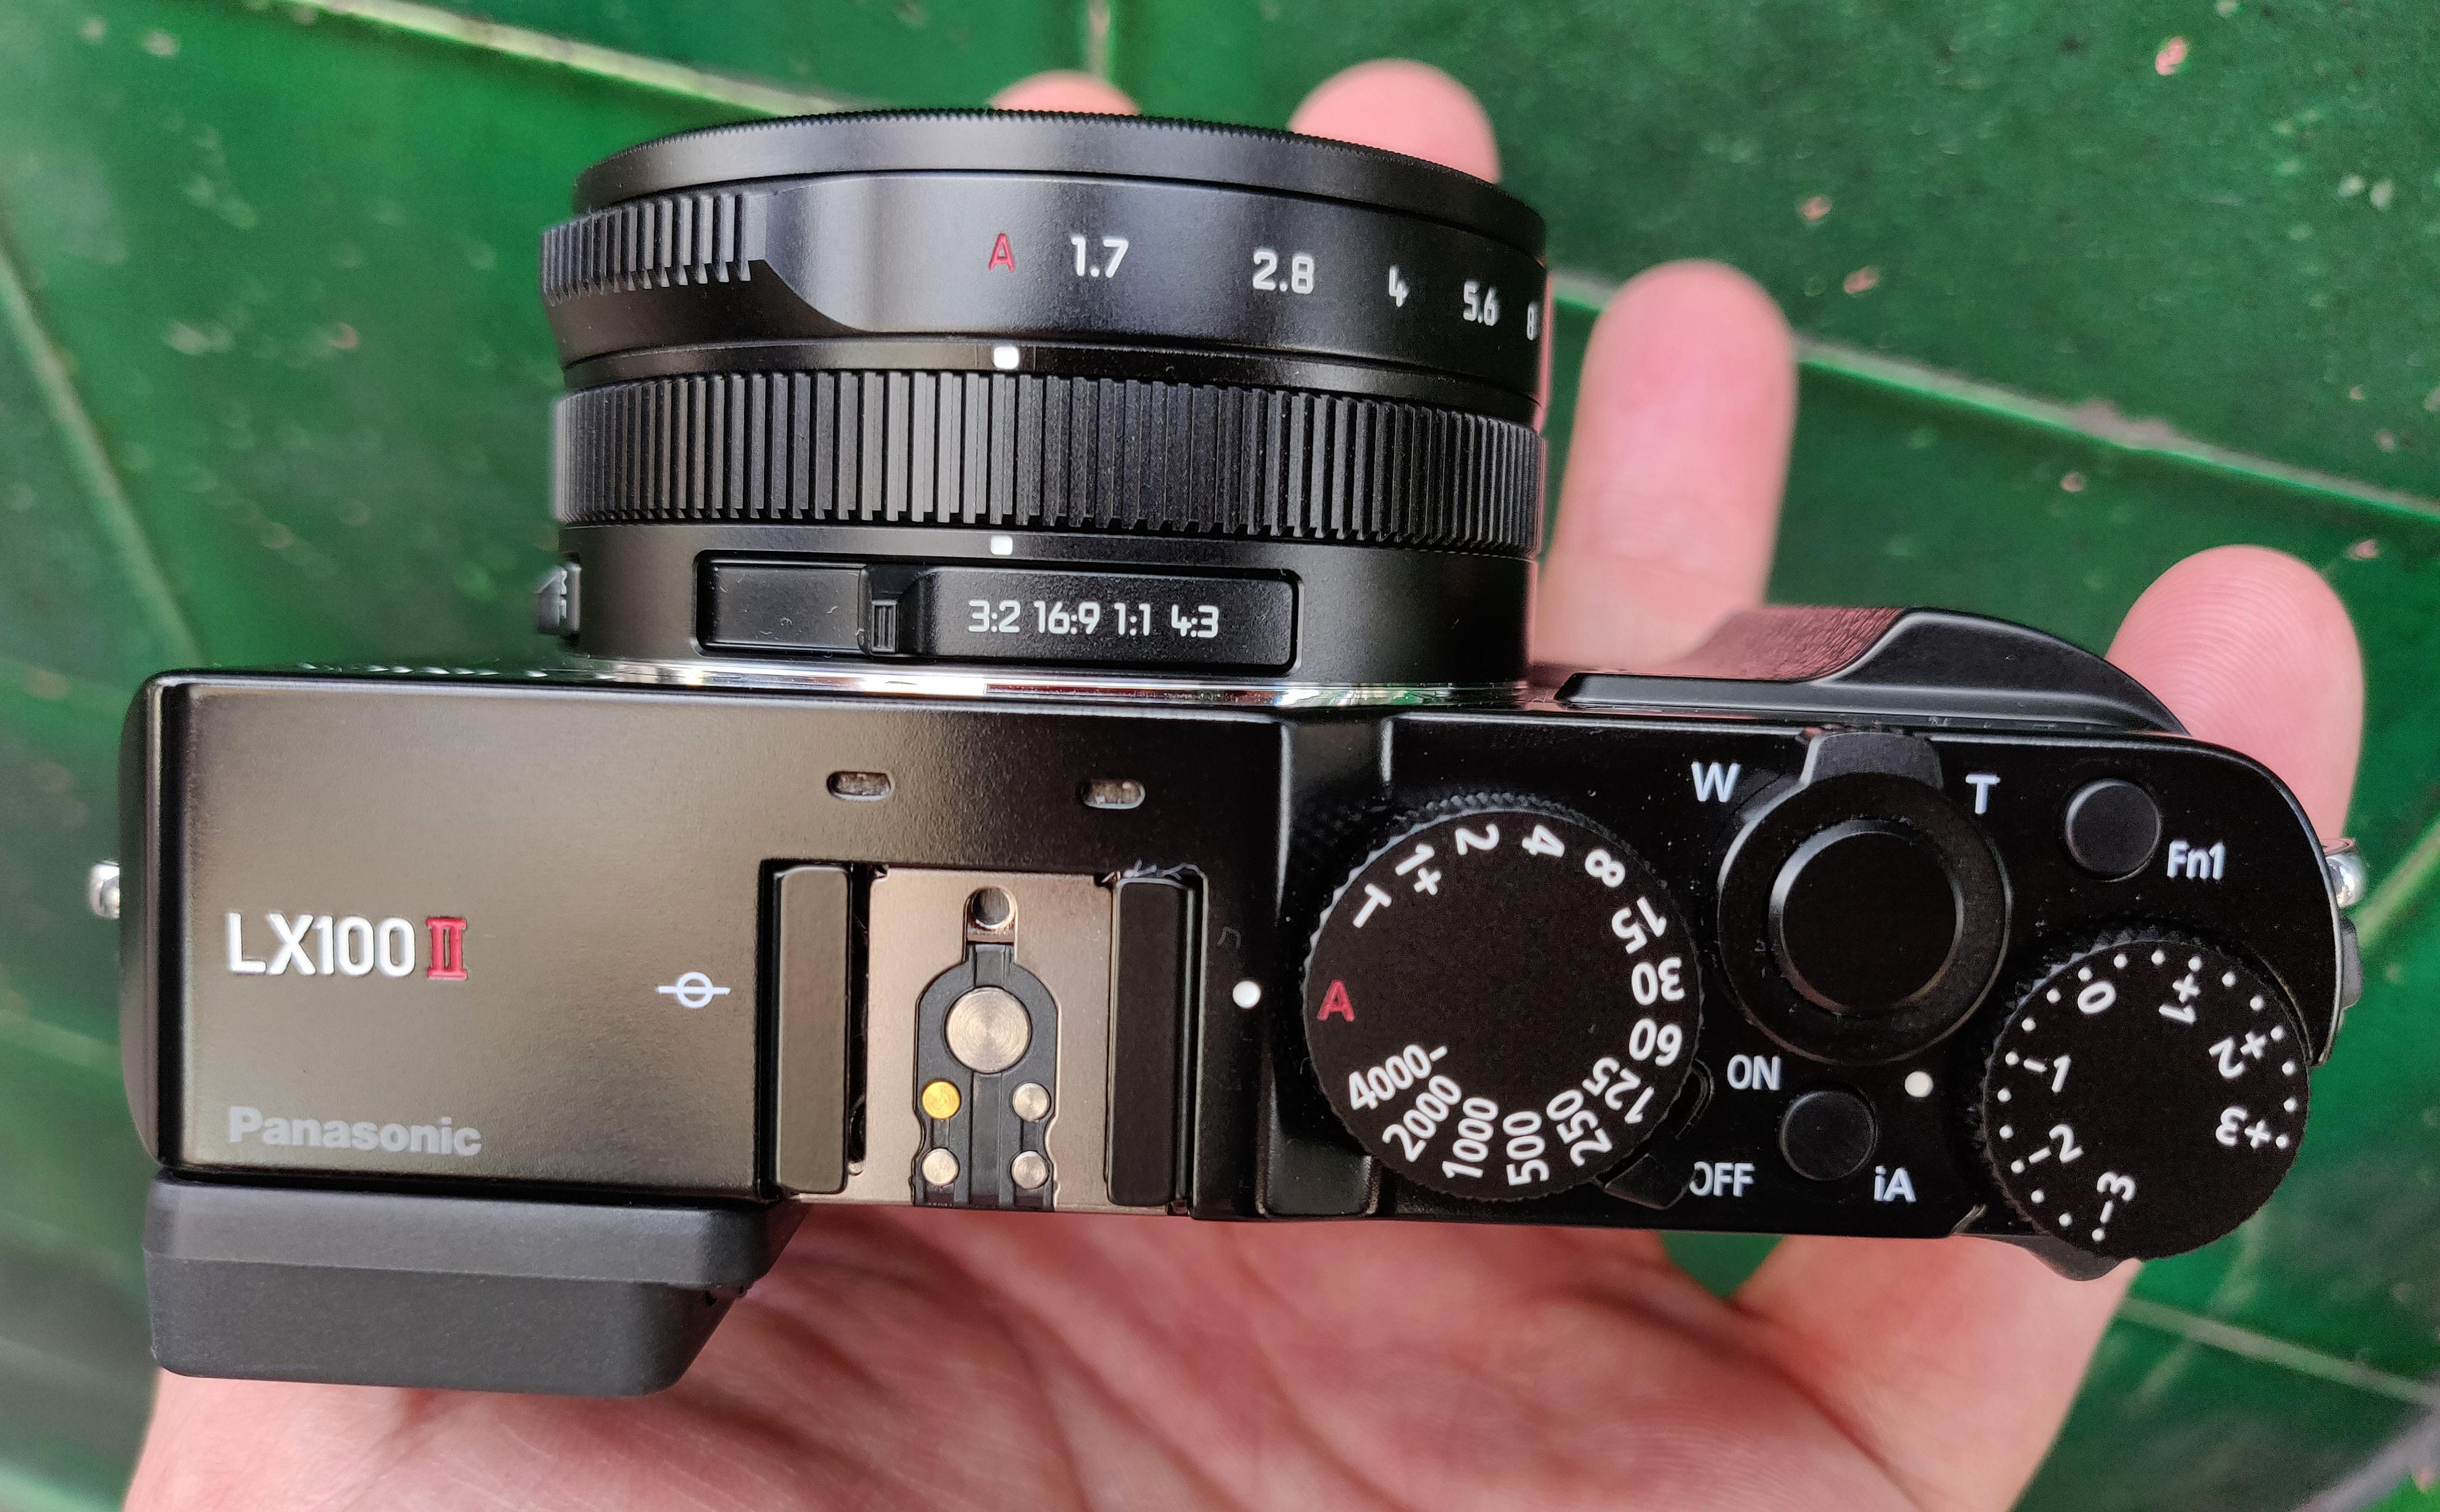 Panasonic Lumix LX100 II Full Review | PicABoo Photography Blog